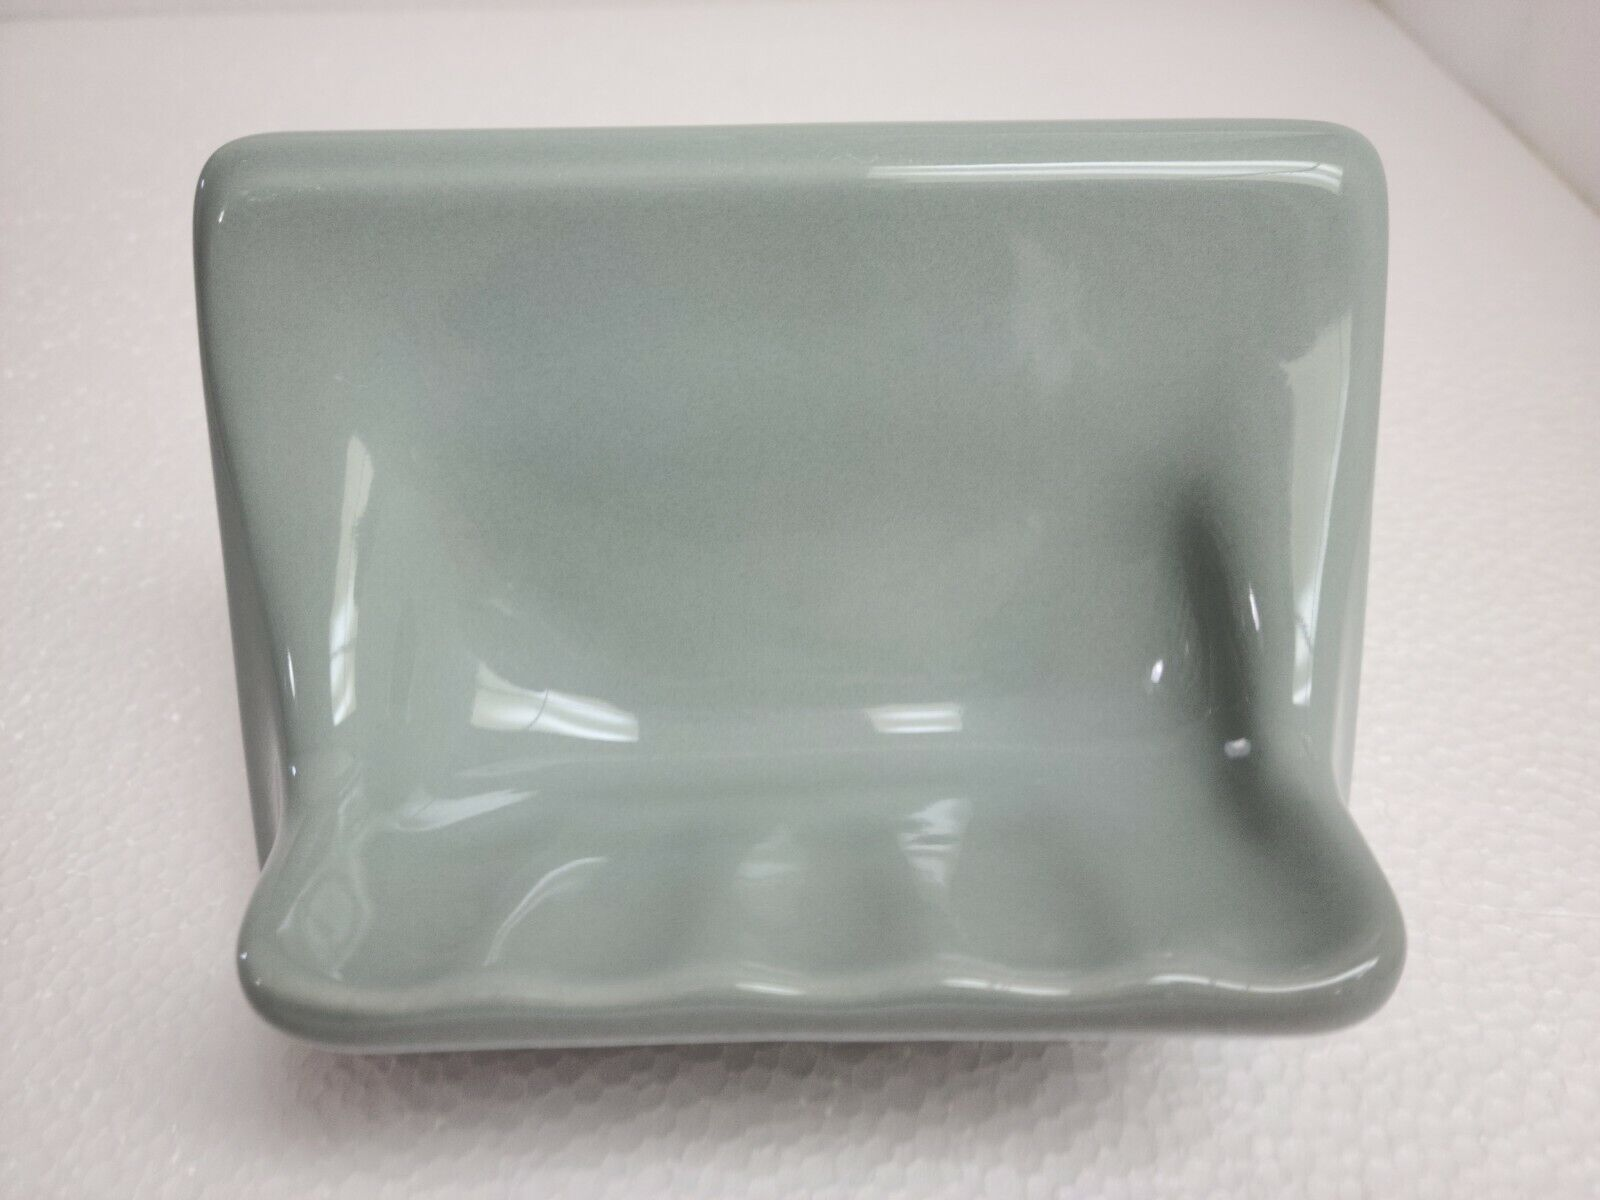 Green Silver Ceramic Soap Dish Tray Tub Shower Blue Vintage Mid Century Modern